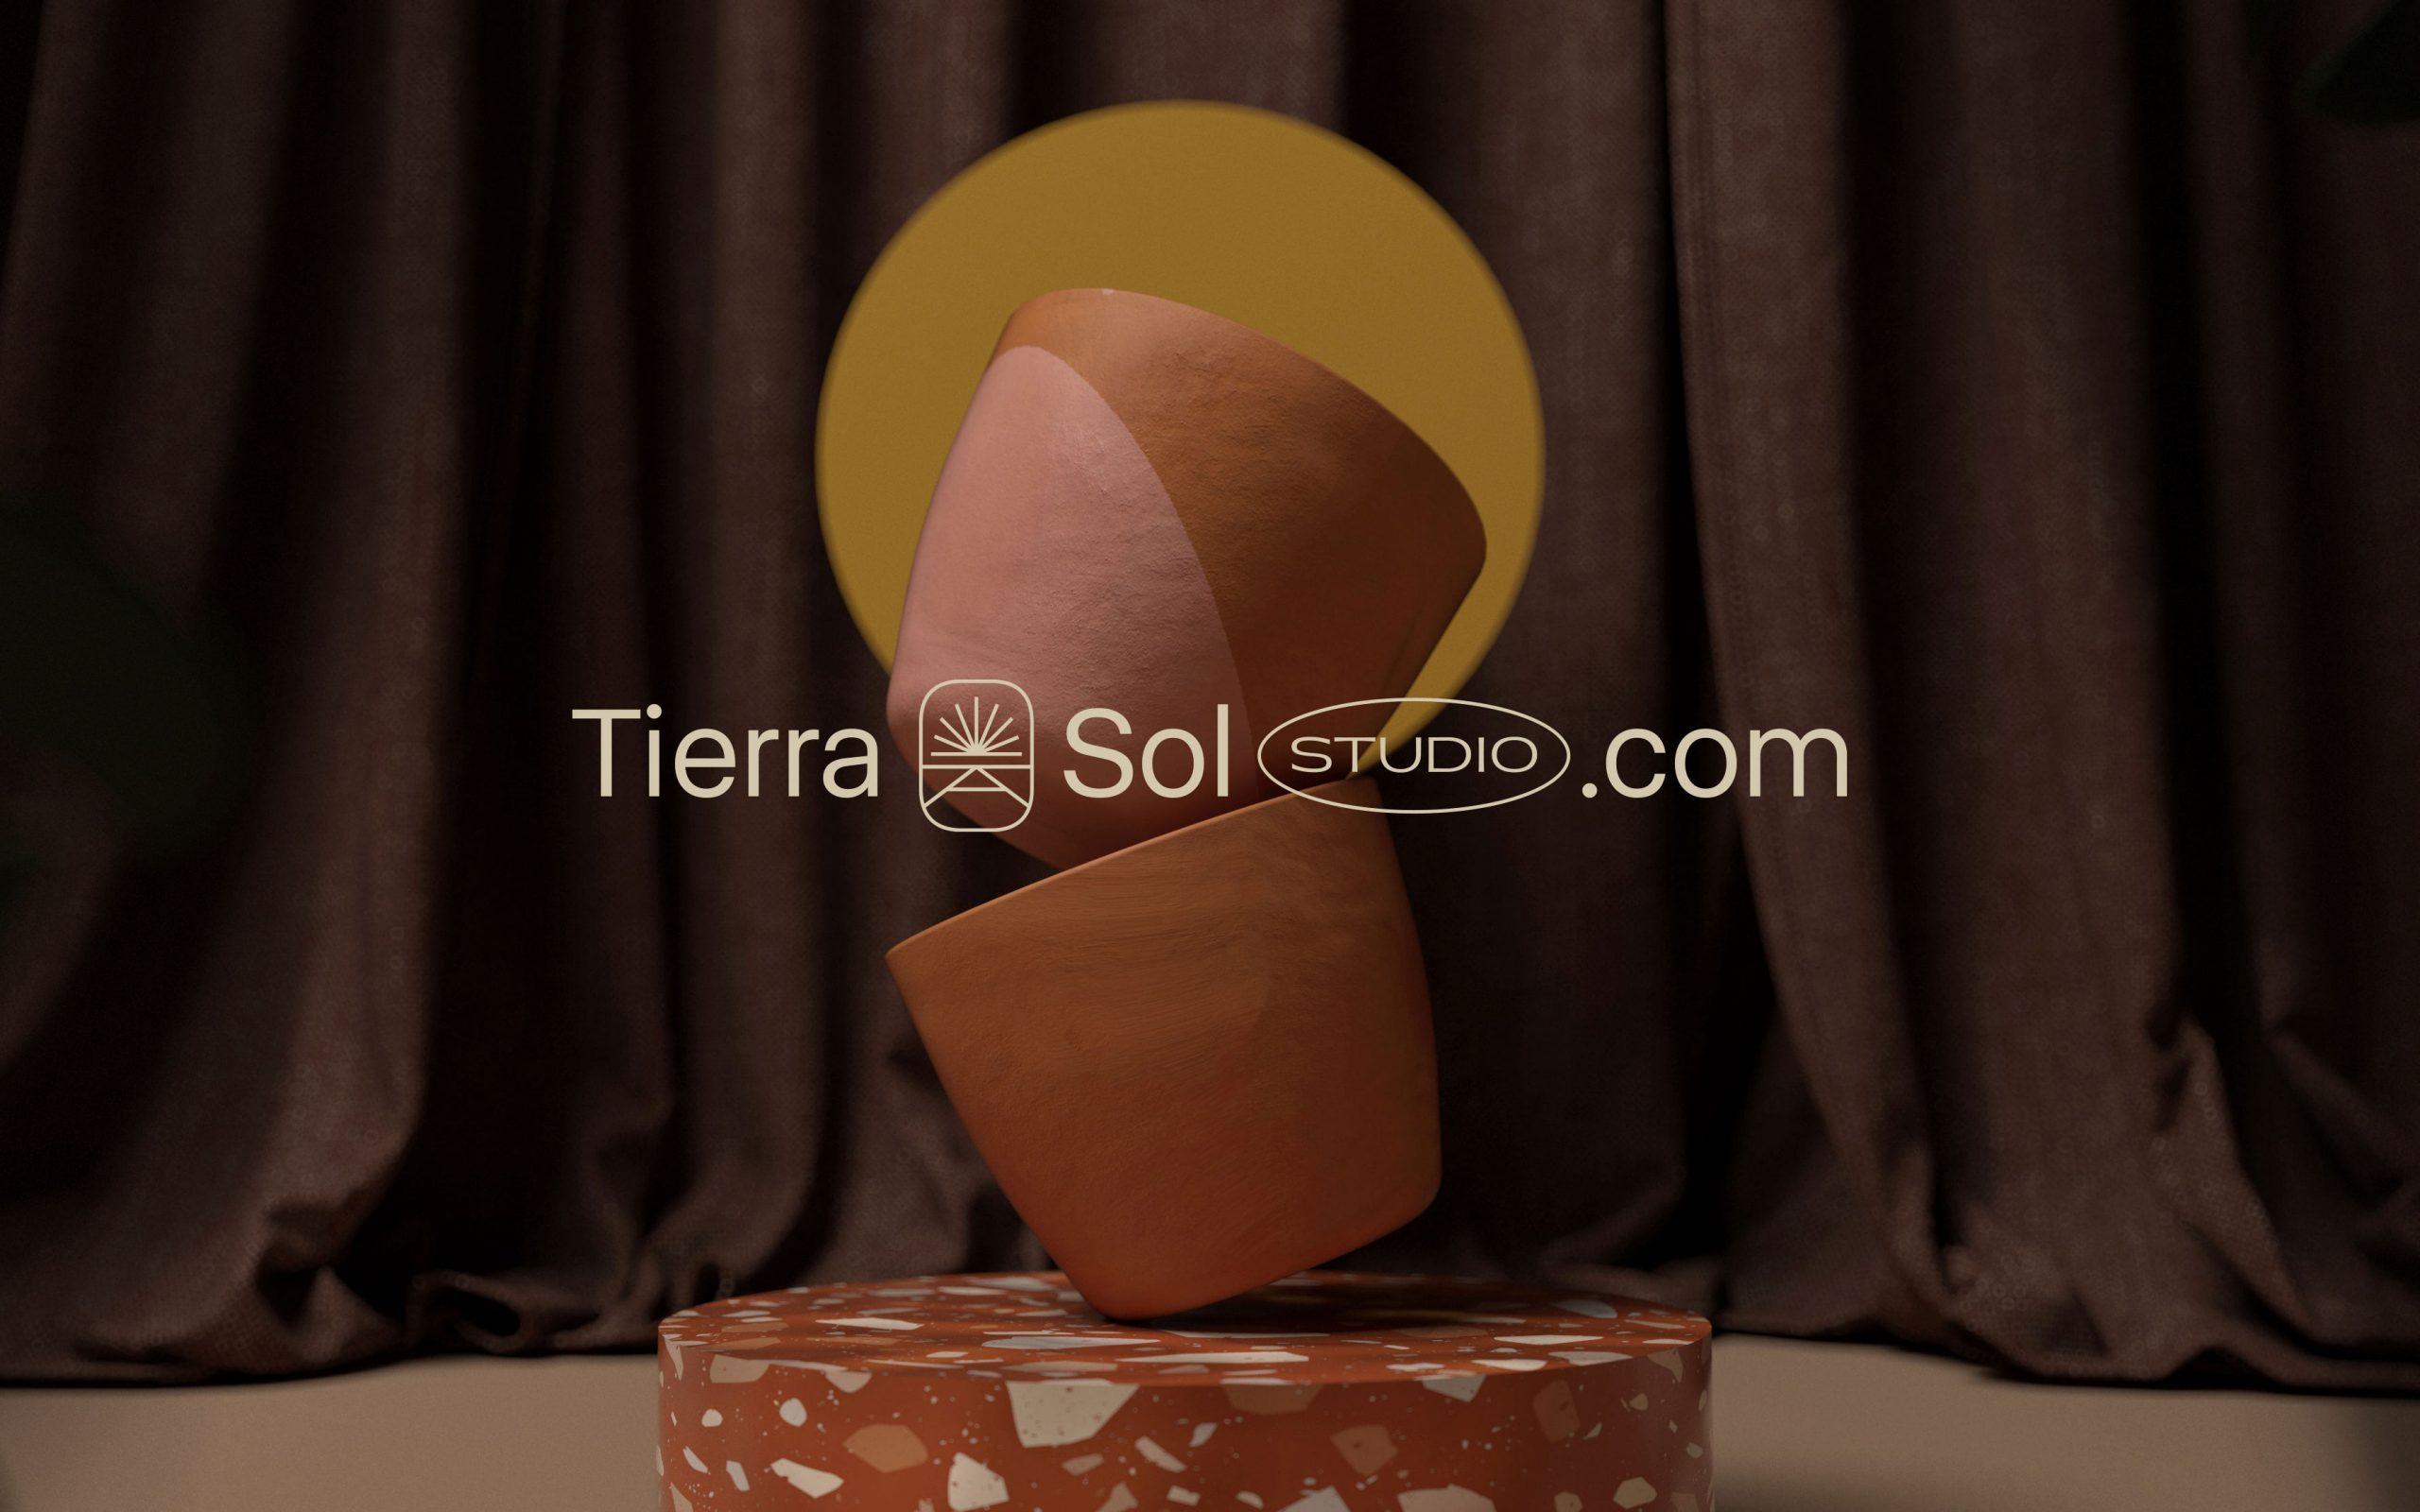 Tierra-Sol-012